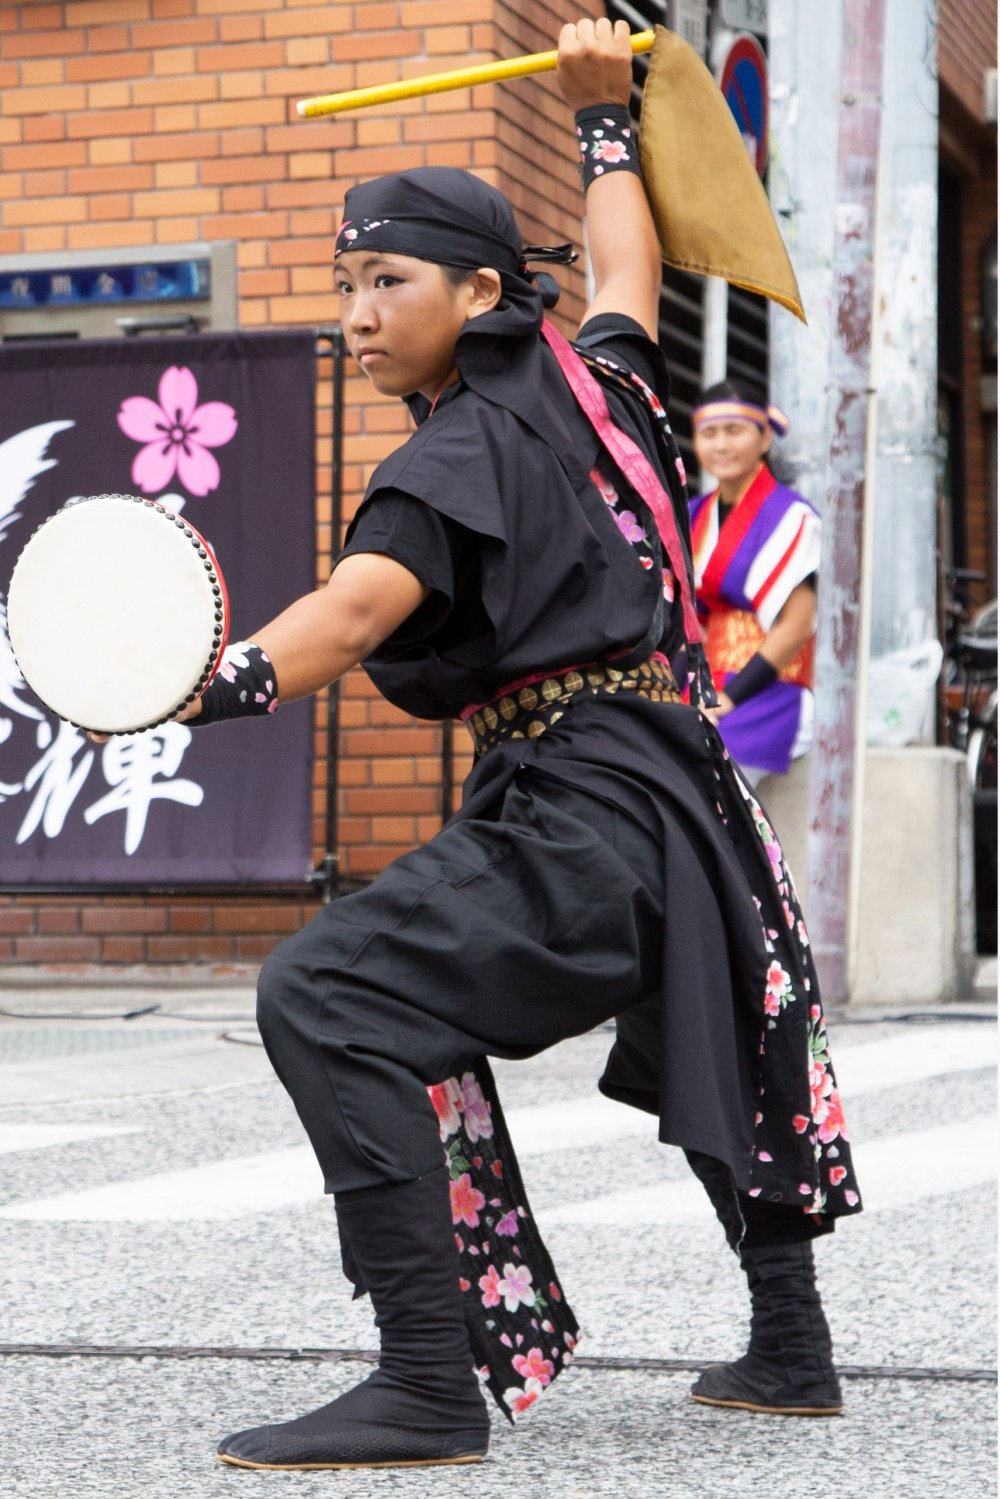 Eisa performer during summer festivities